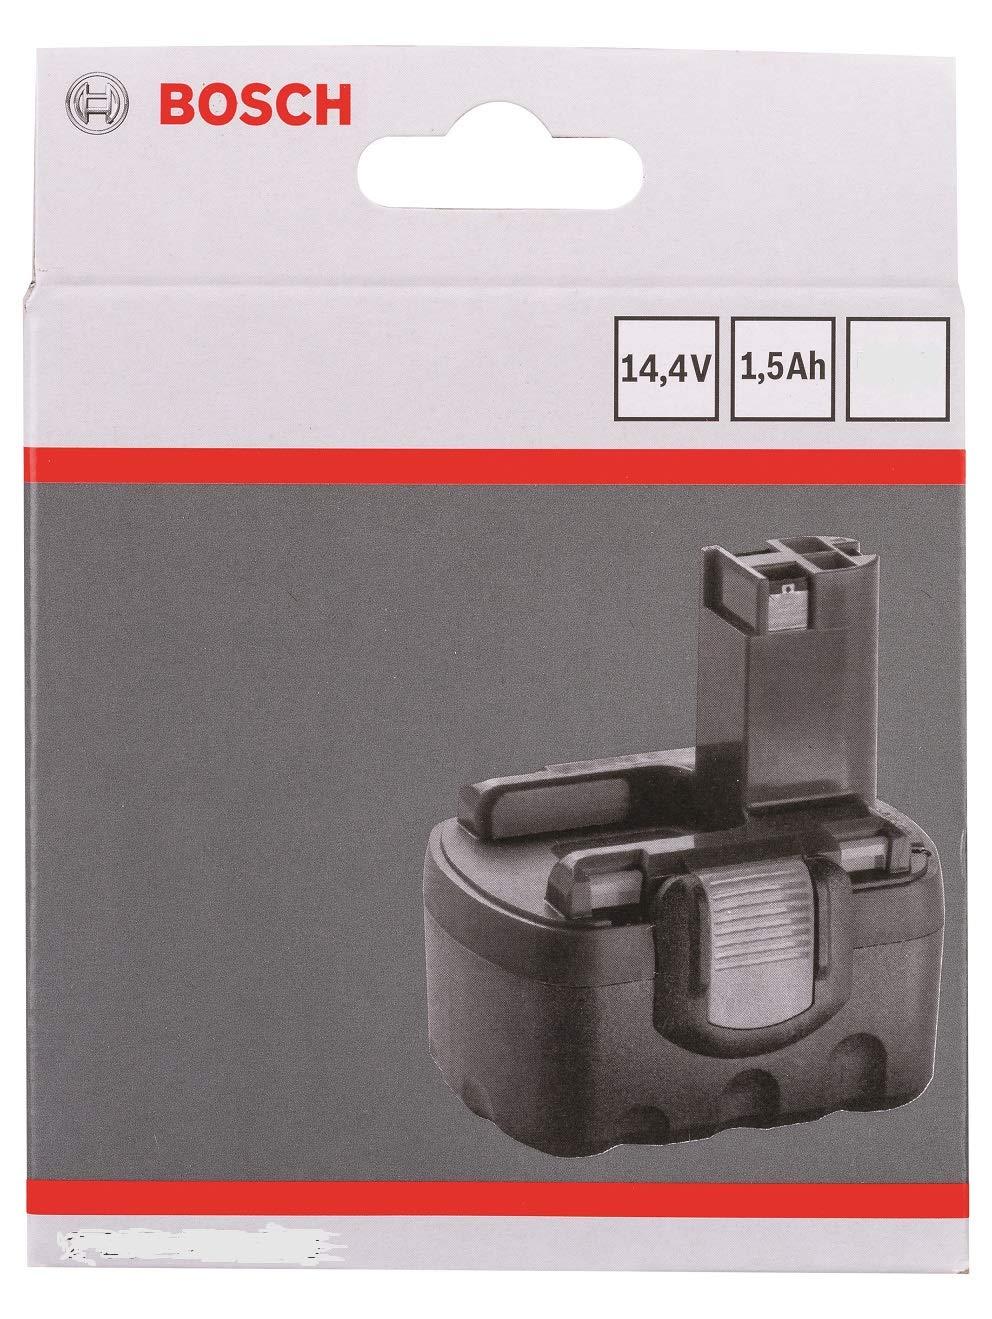 Bosch Genuine 14.4V c//w STANLEY KeyTape Pod Style Battery VERSION To Fit: BOSCH Cordless AHS 41 Accu Hedgecutter and Cordless AHS 52 Accu Hedgecutter image shown + Cadbury Chocolate Bar 1.5Ah